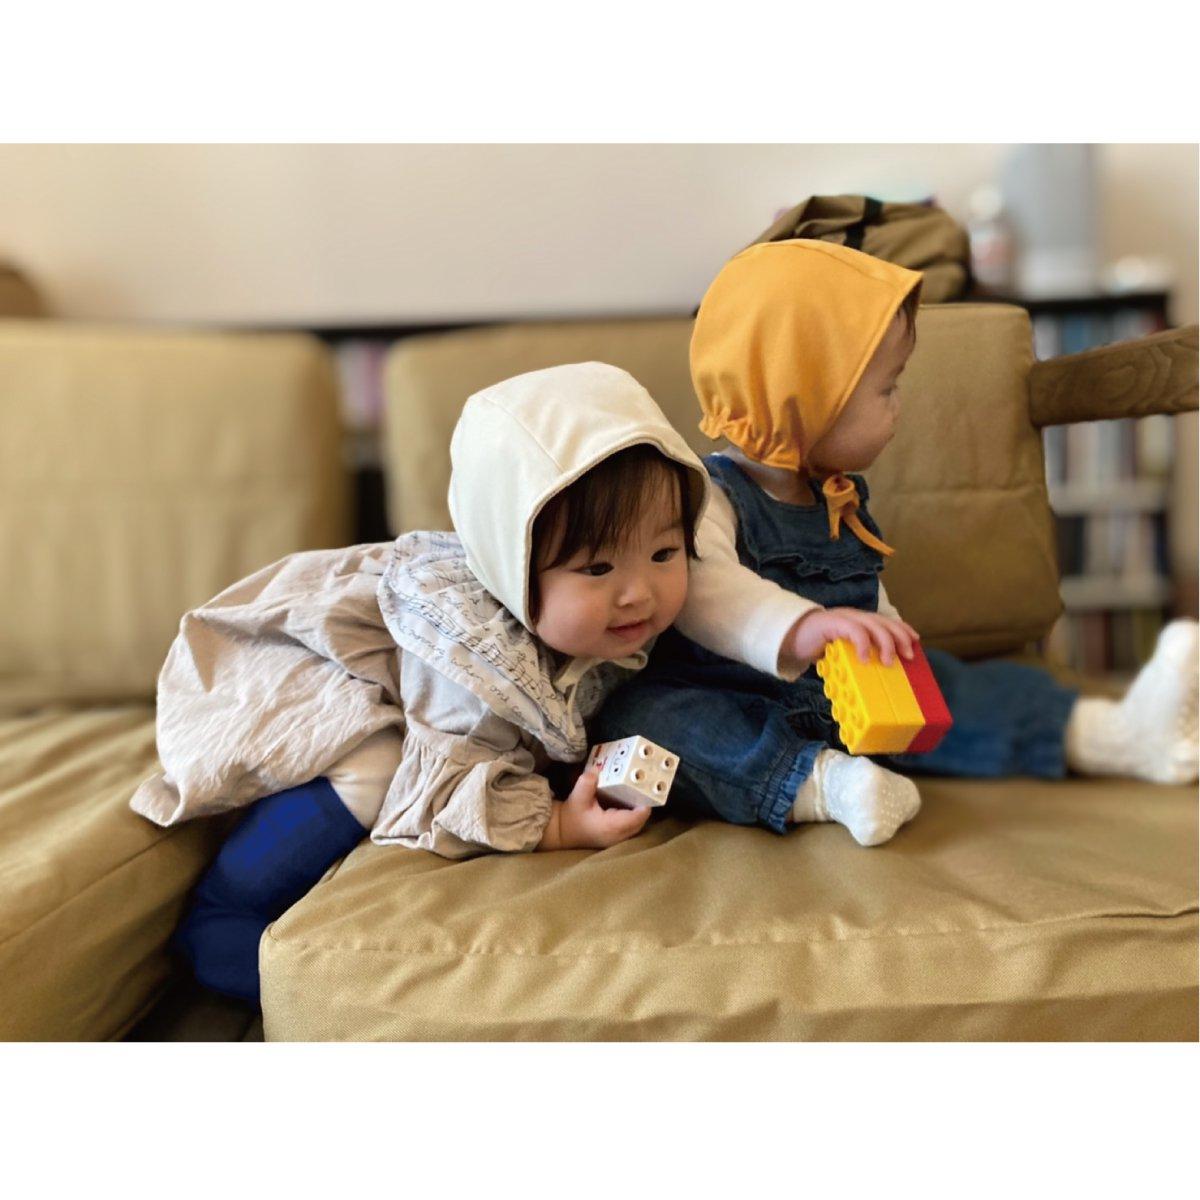 【BABY】Candy Bonnet 詳細画像19